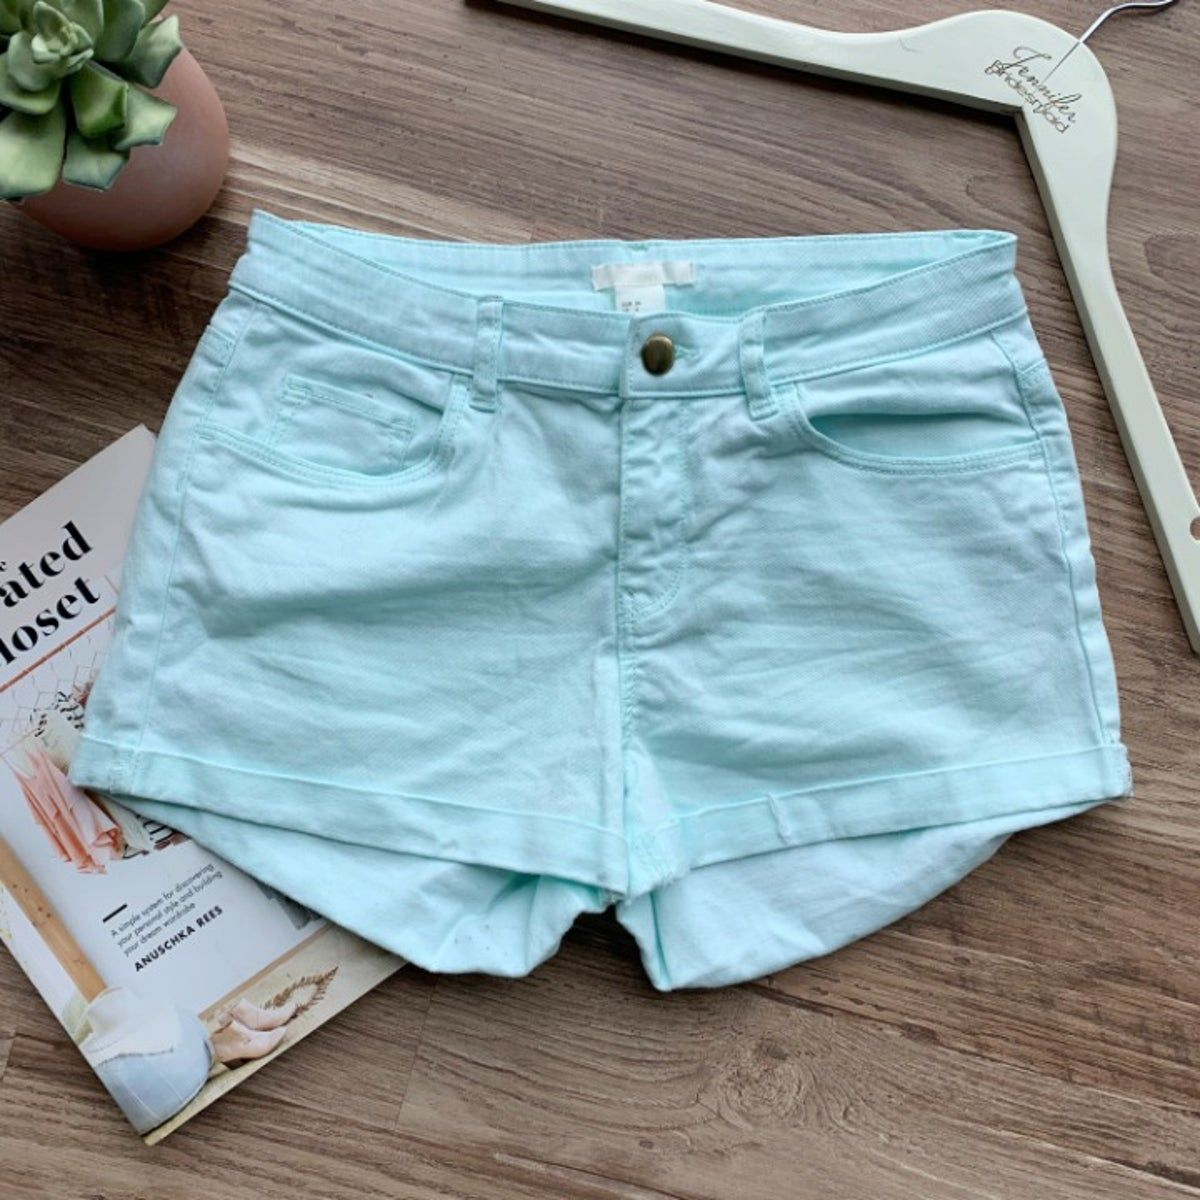 H&M Light Blue Denim Shorts #lightblueshorts